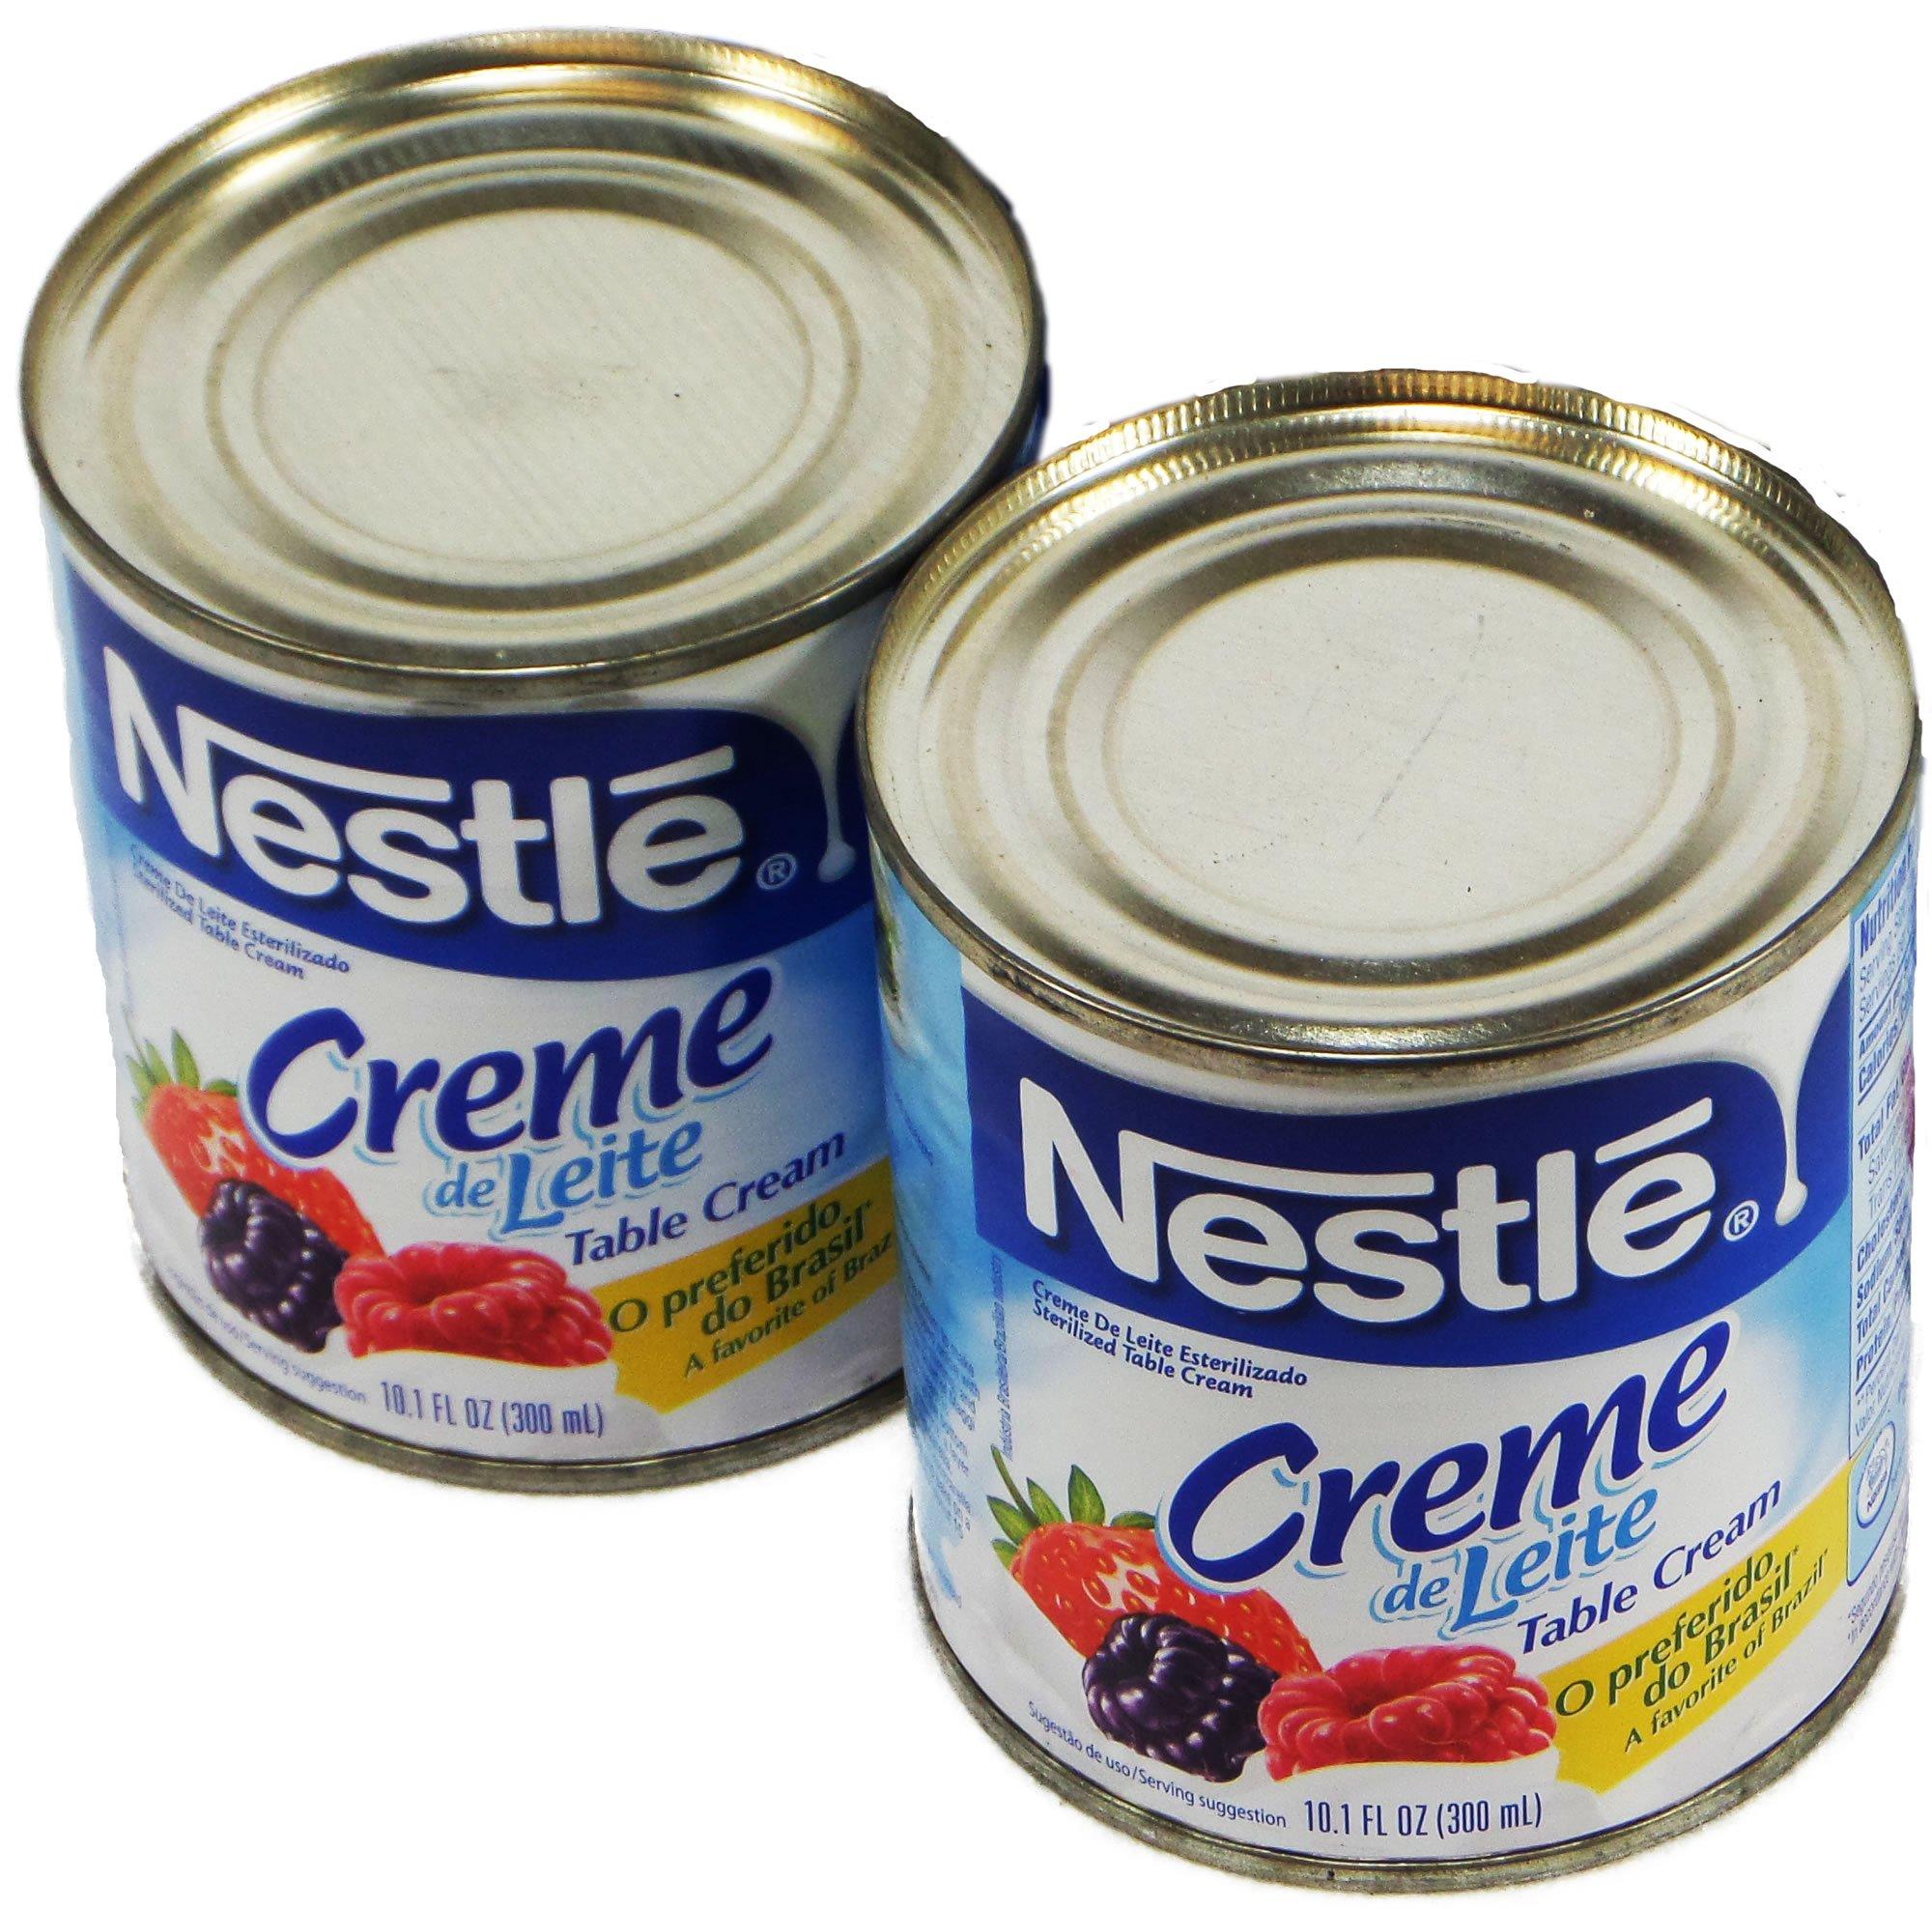 Nestlé - Table Cream - 10.1 fl. Oz. (PACK OF 02) | Creme de Leite - 300ml